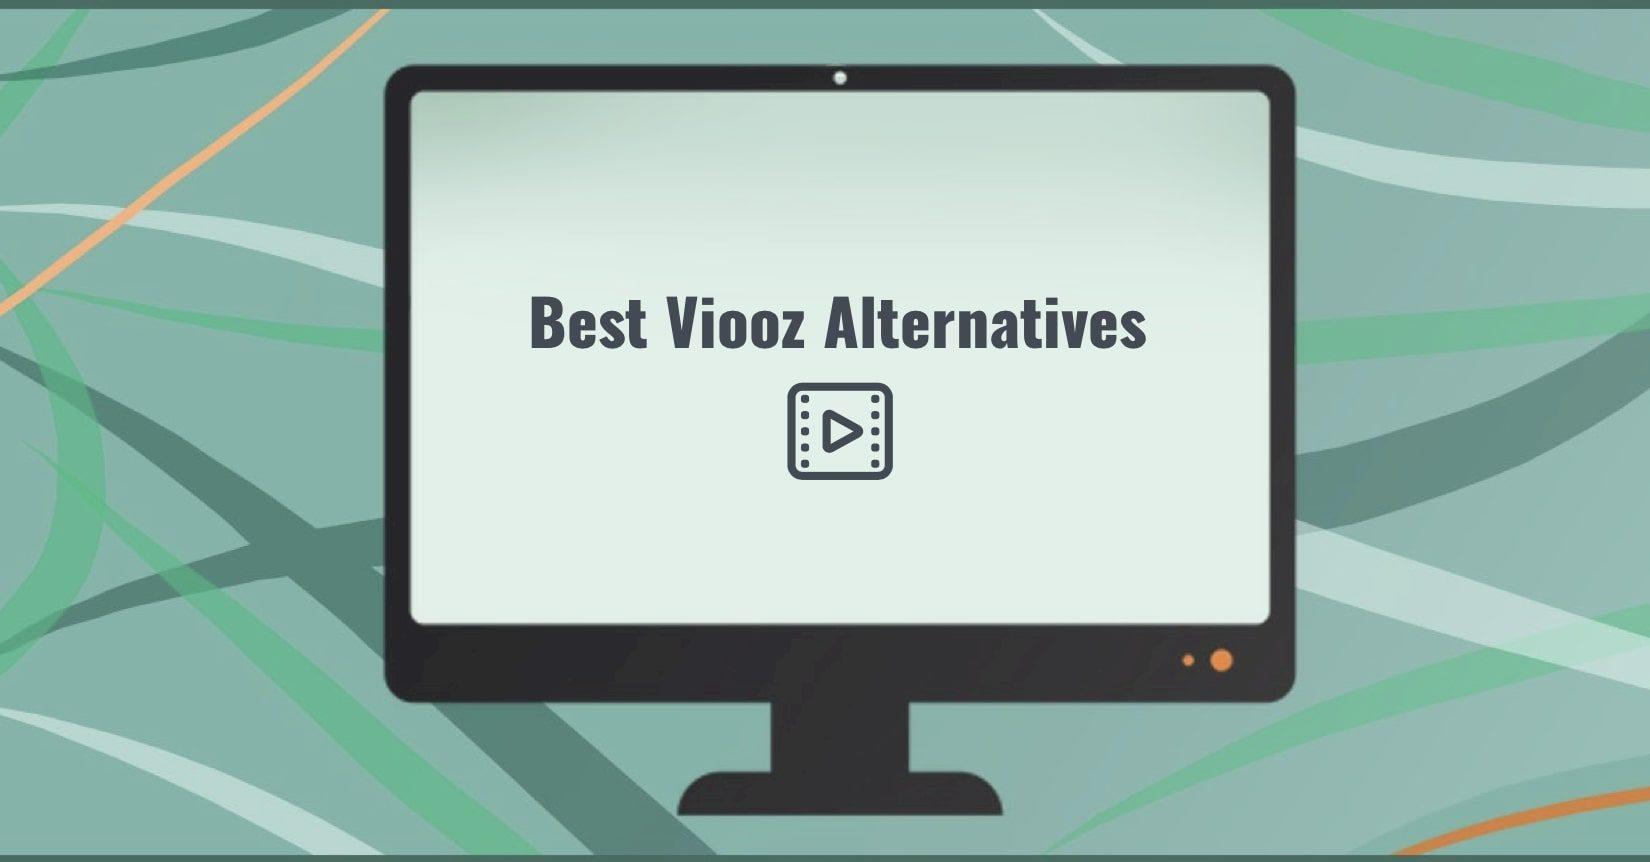 Best Viooz Alternatives